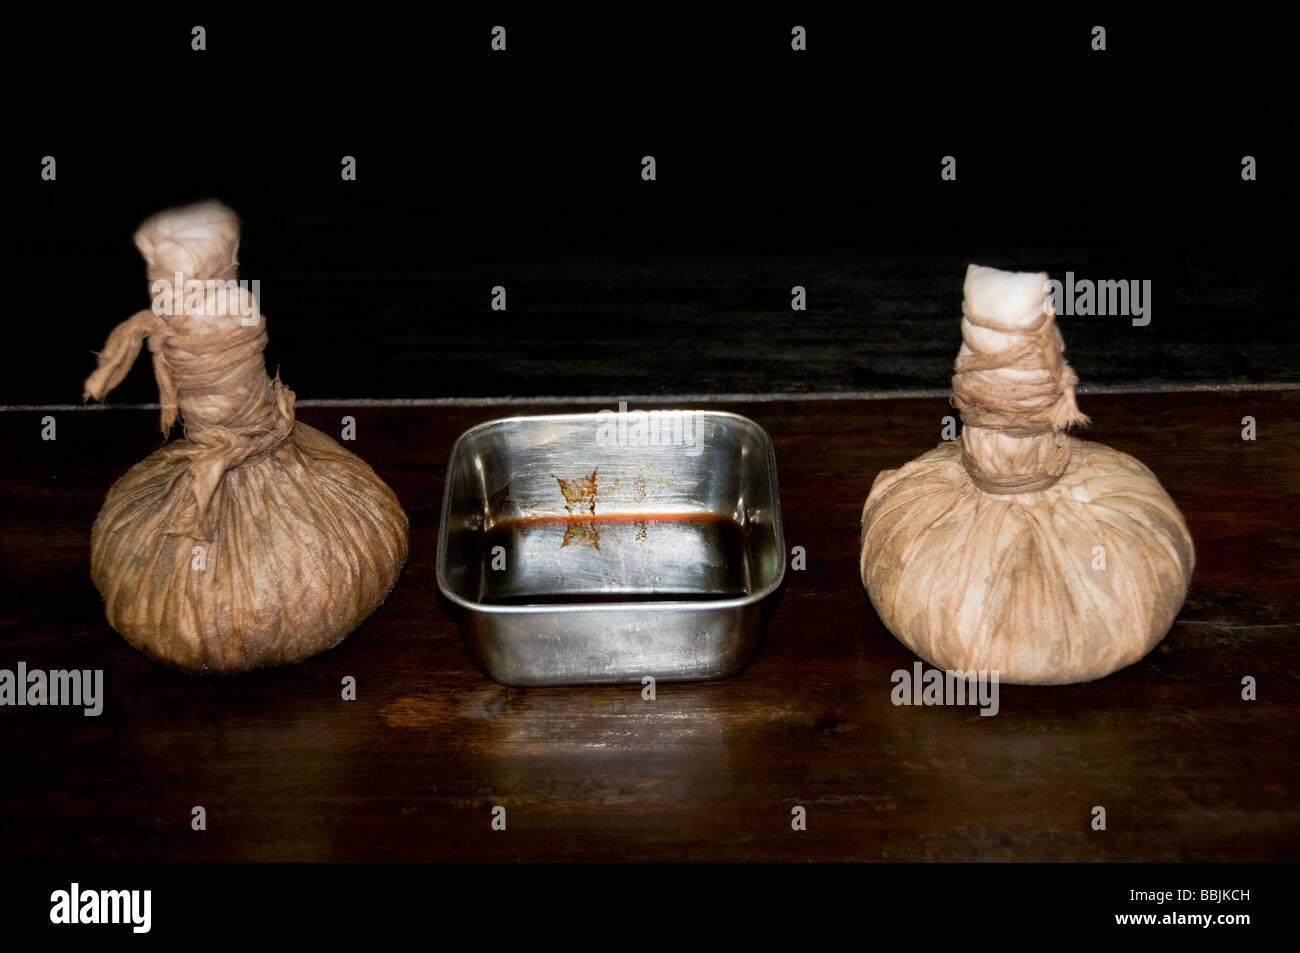 herbal bags or Kizhi used for ayurveda massage, ayurvedic treatment, kerala India - Stock Image